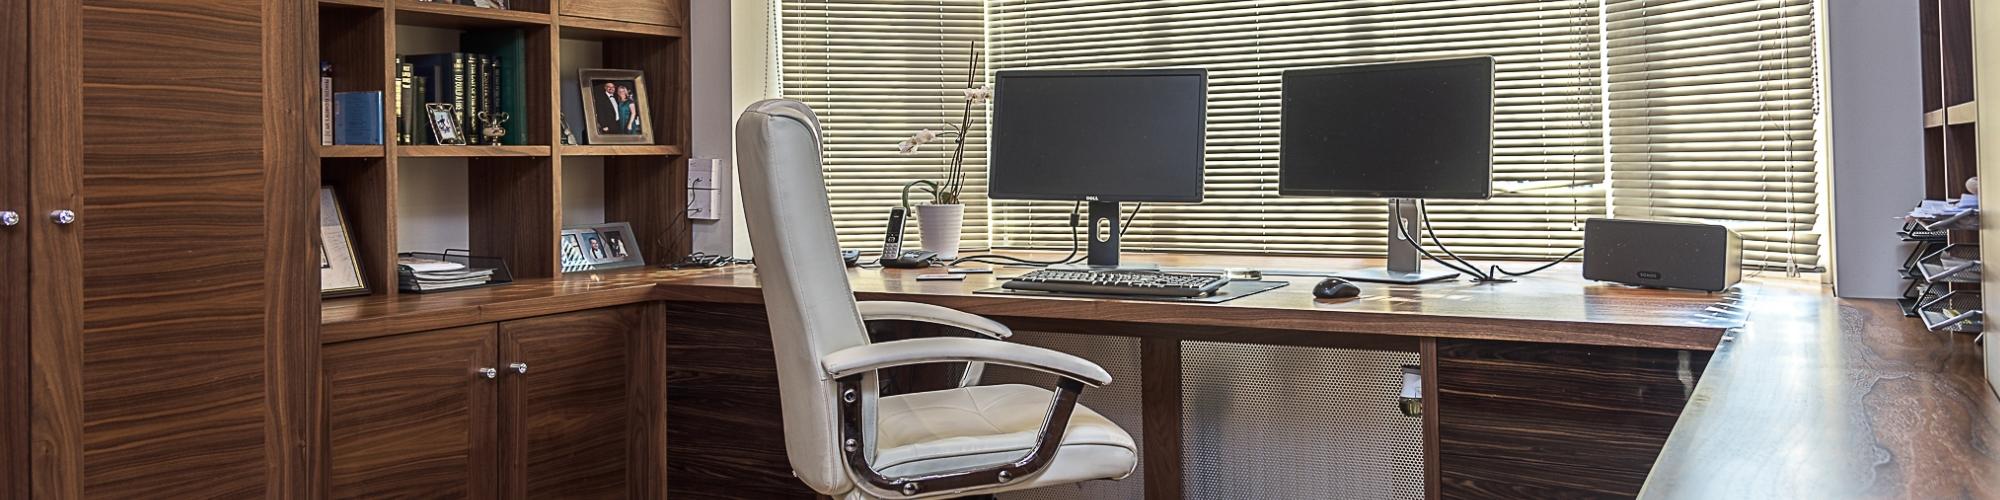 Home Study Furniture Homewood Furniture Regarding Bespoke Study Furniture (#11 of 15)